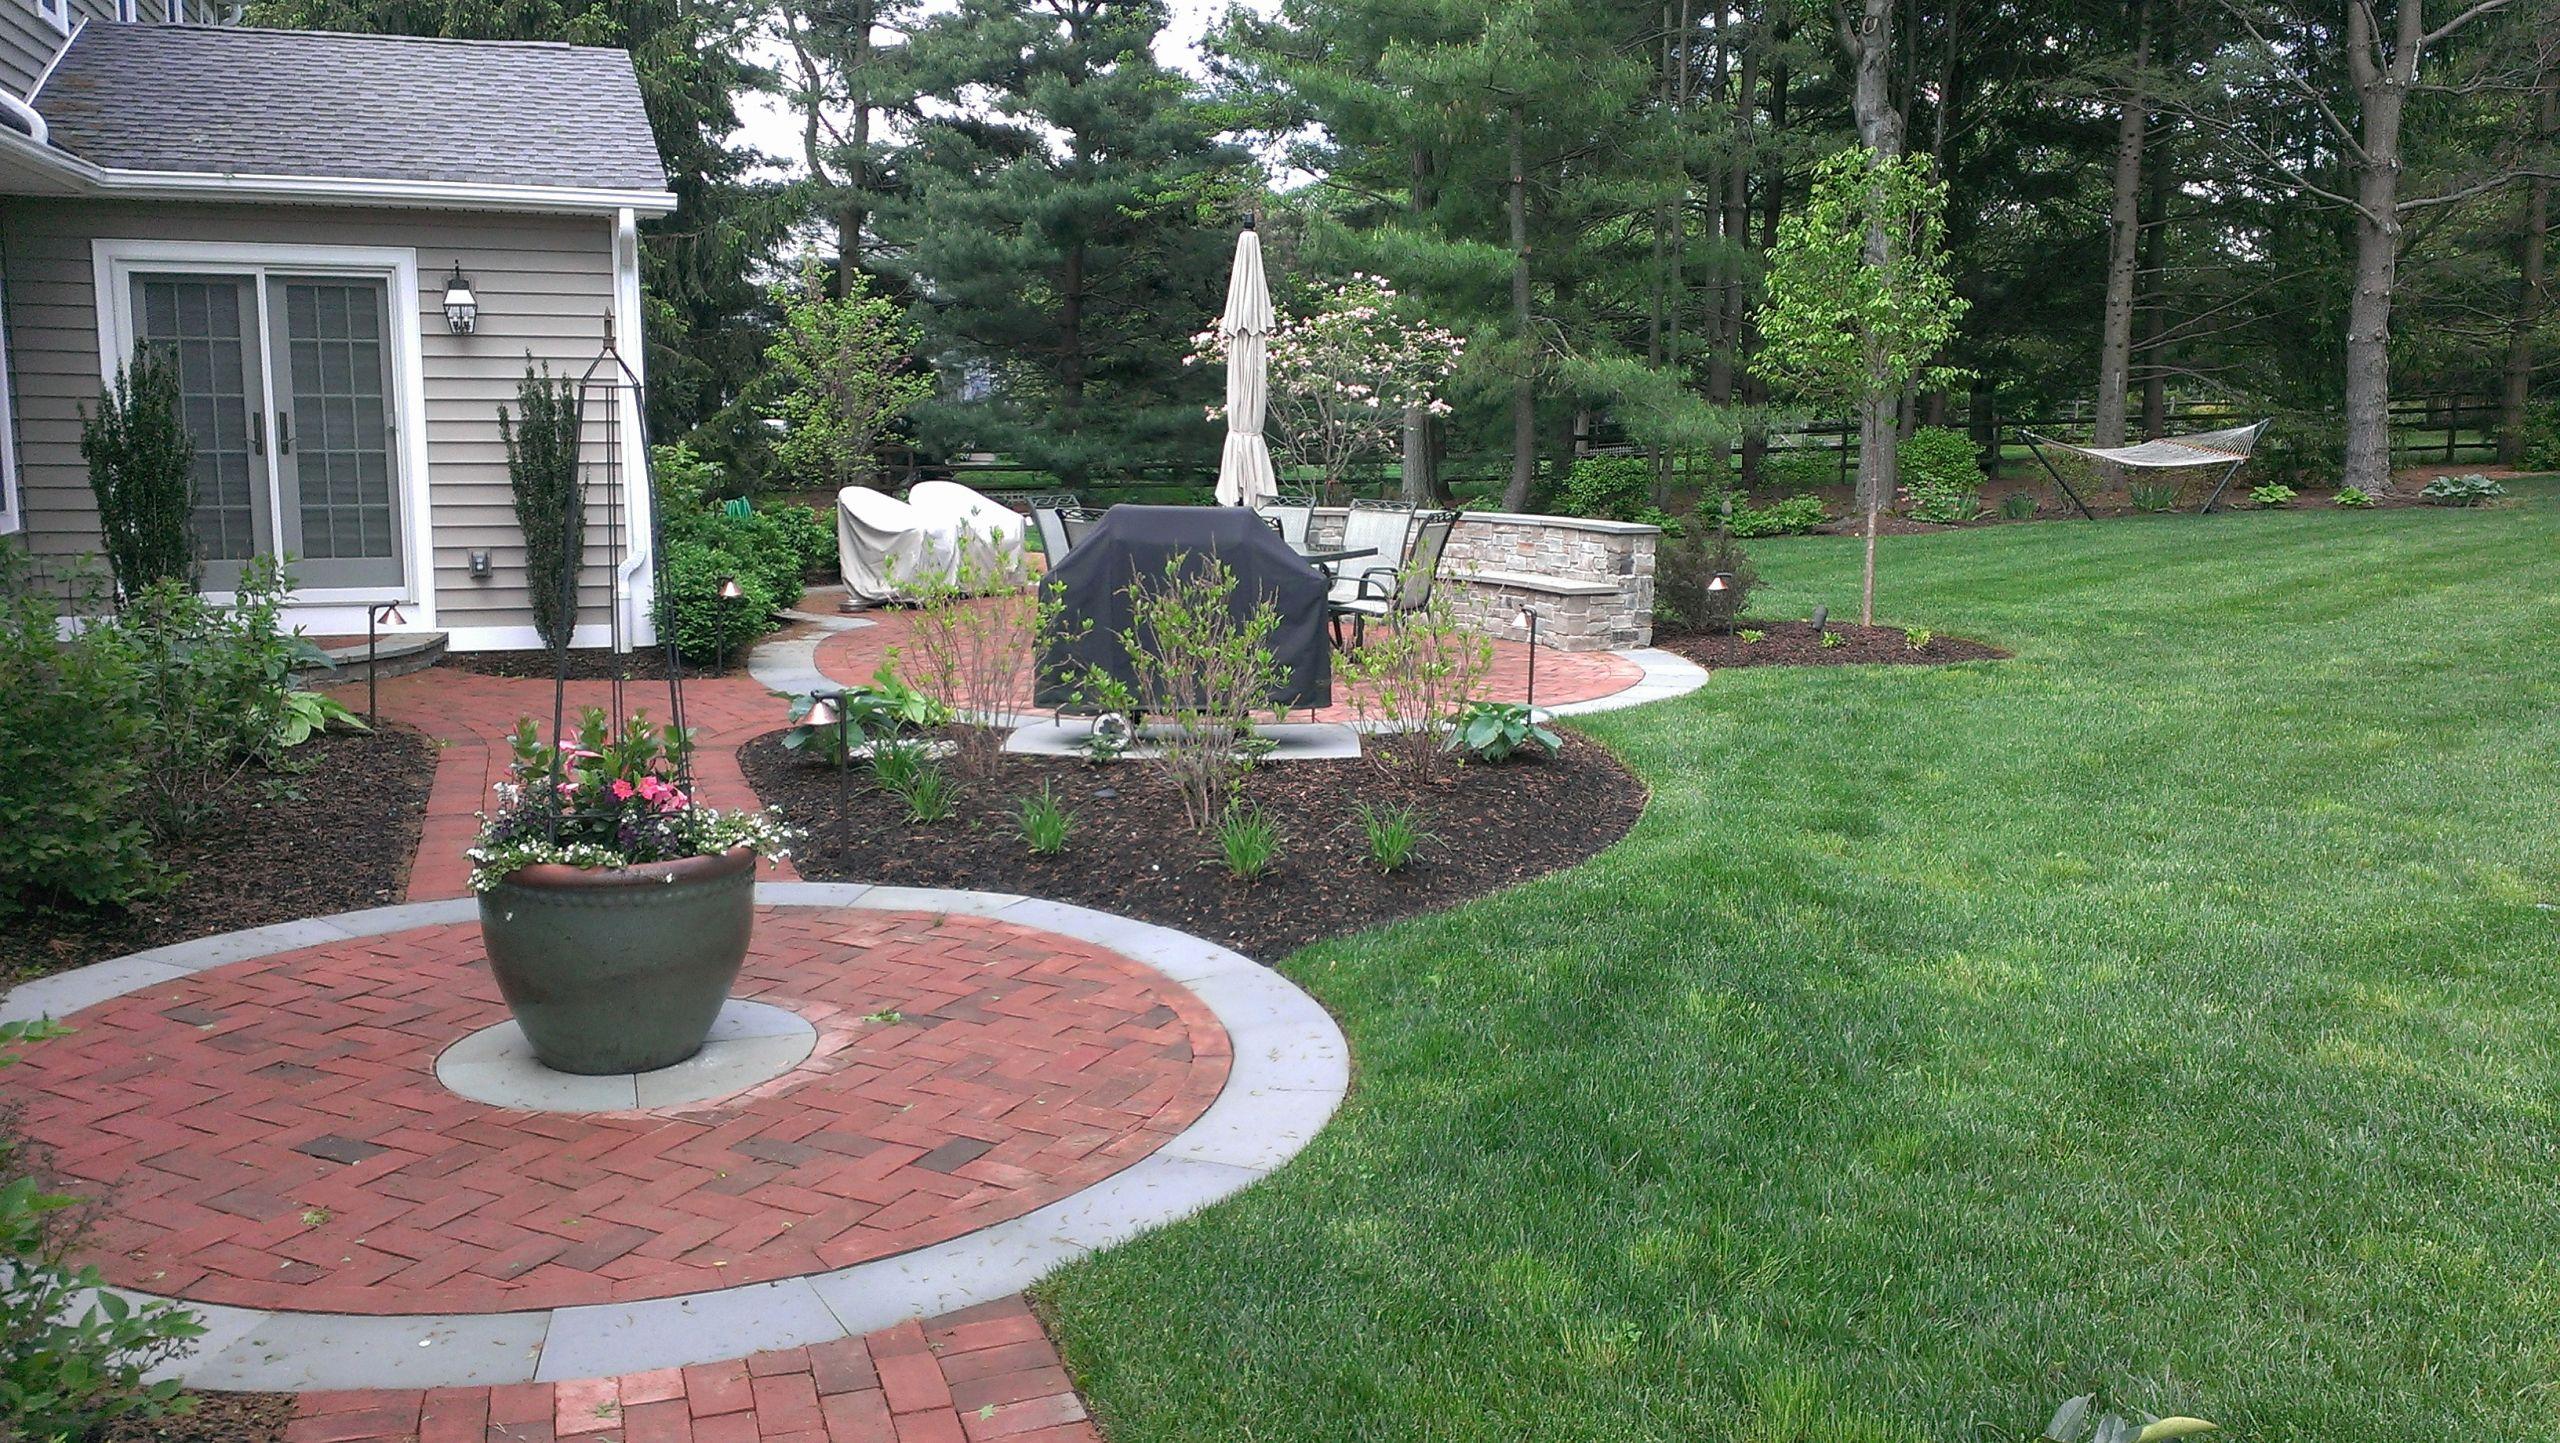 garden walkways lovely patios and walkways cool graphy fresh diy stone patio ideas s of garden walkways